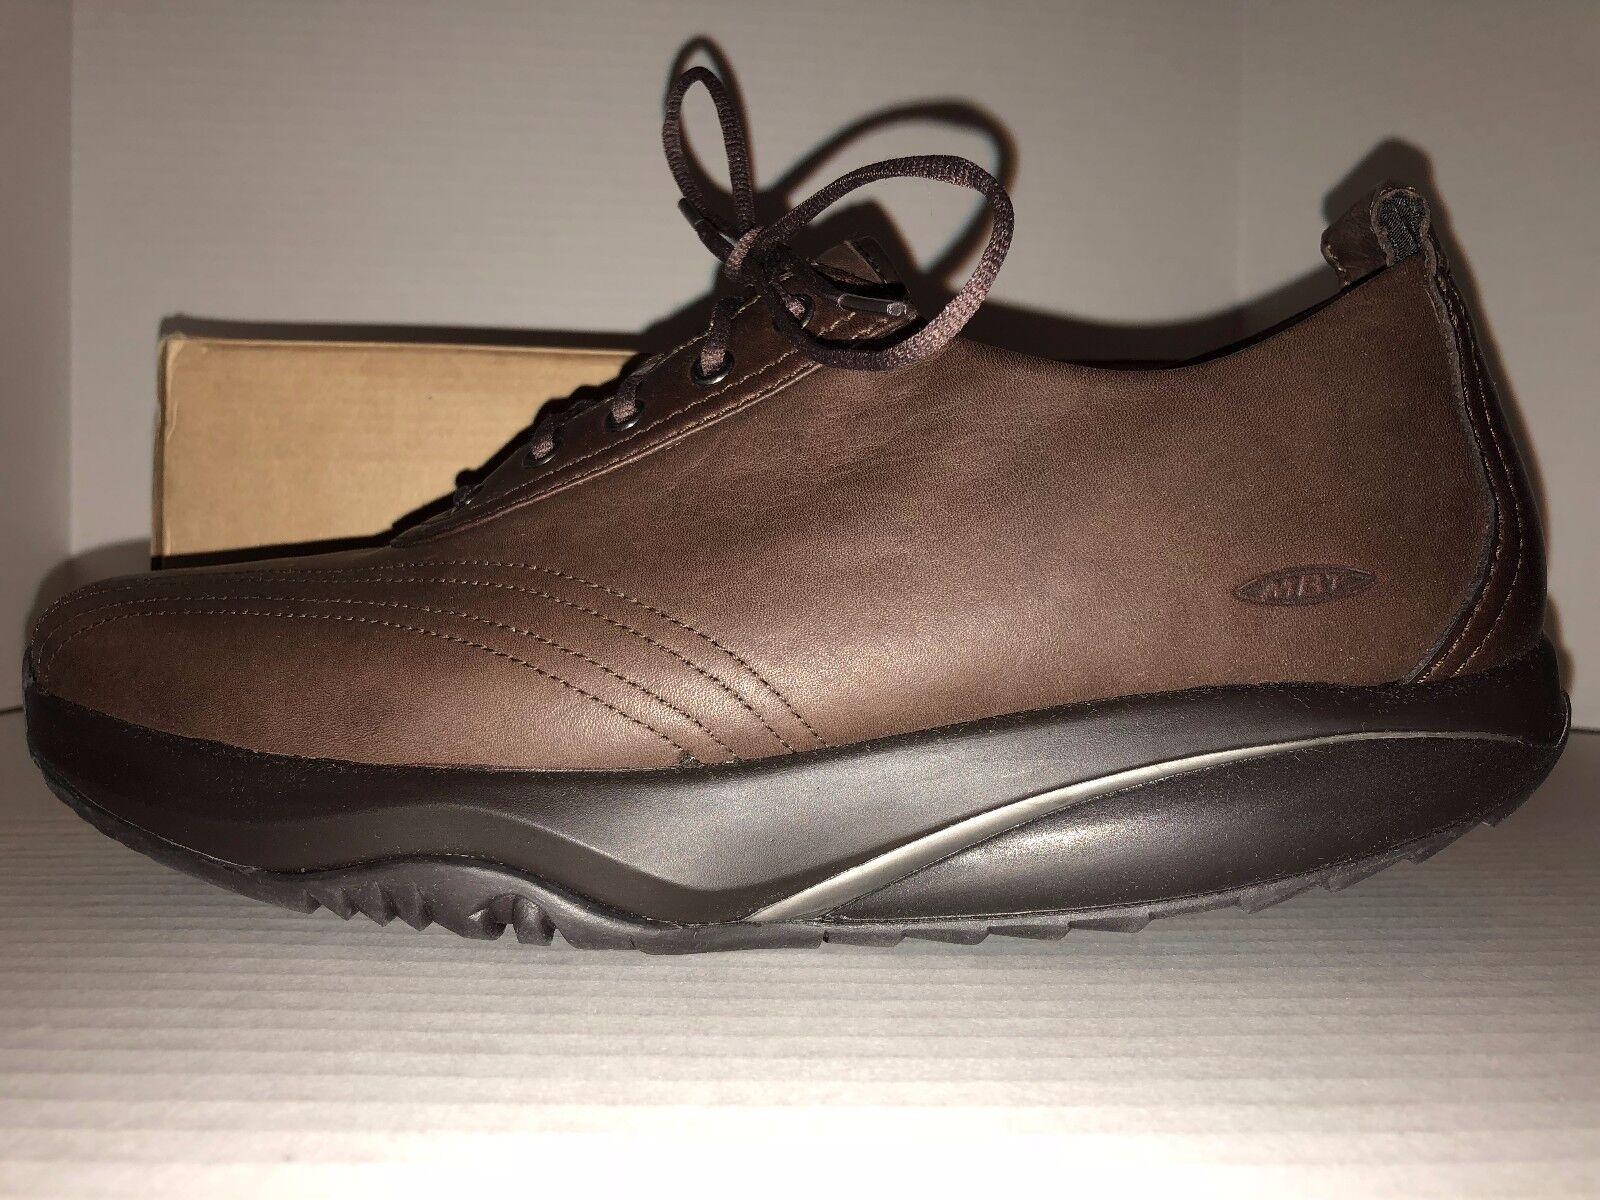 Women's Women's Women's NEW size 11 MBT Wingu Brown Leather shoes 9f9156